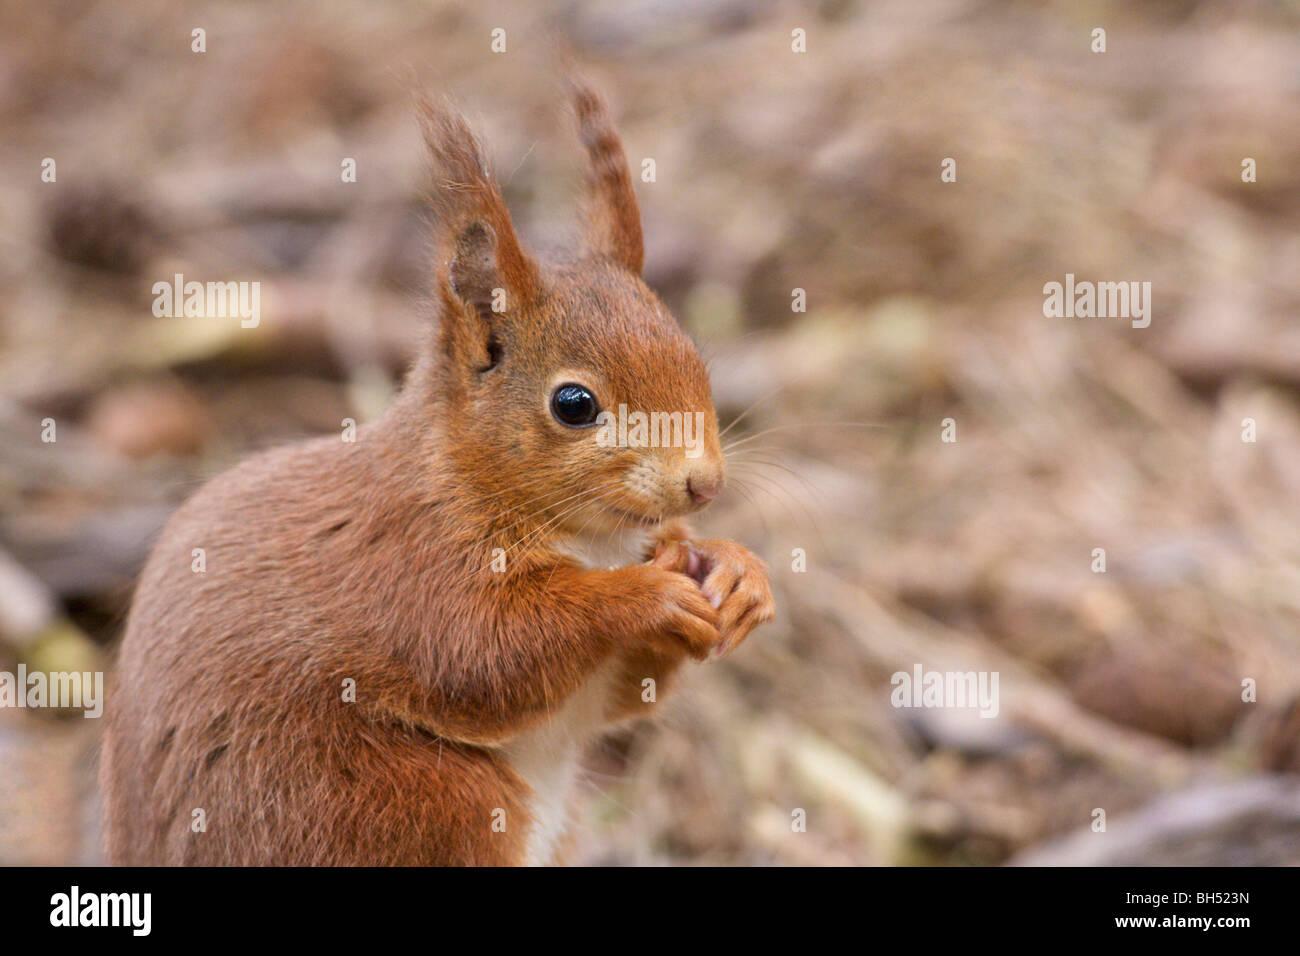 Red squirrel (Sciurius vulgaris) feeding head and shoulders. - Stock Image